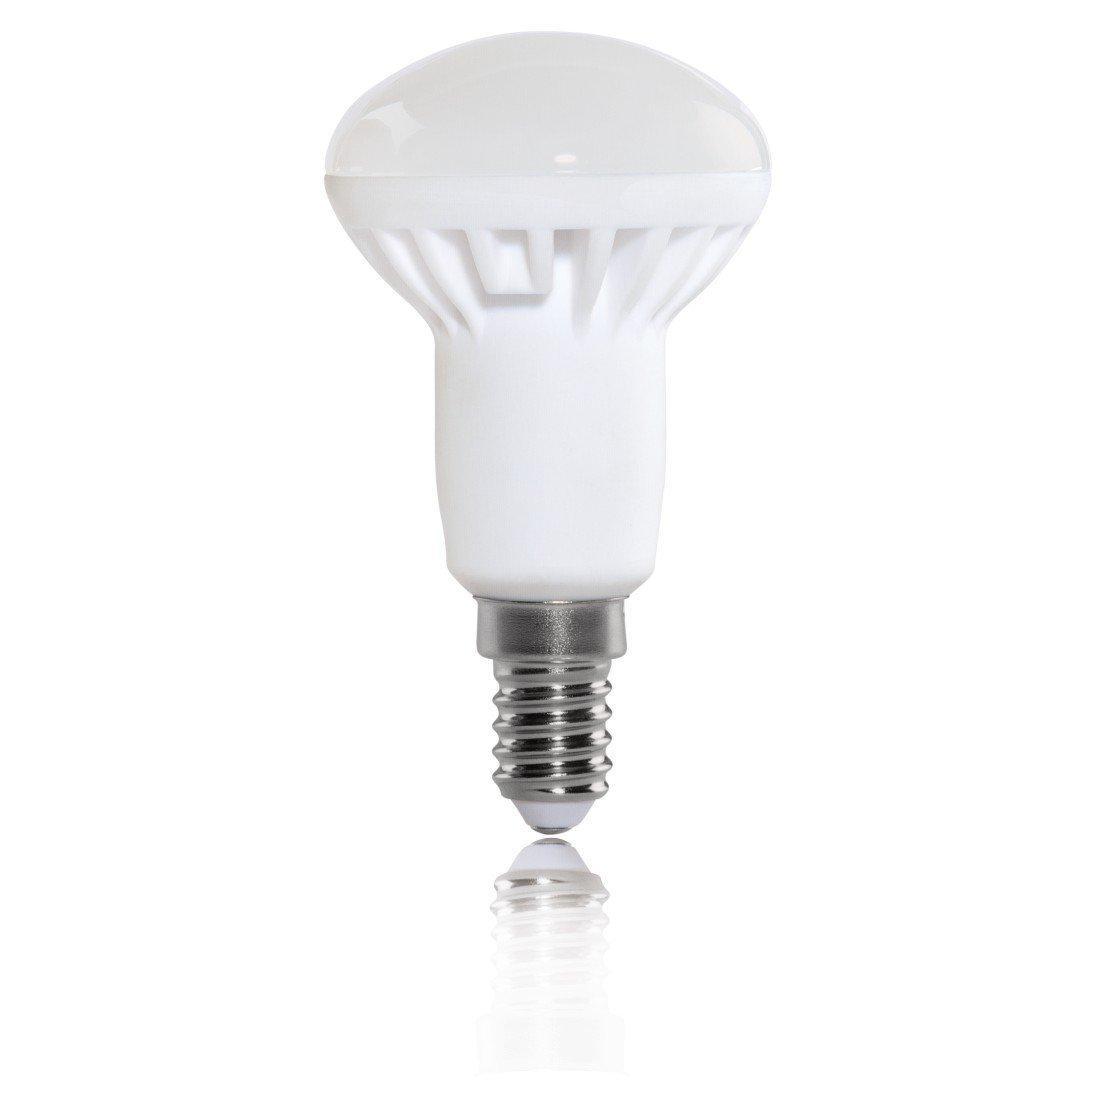 Xavax E14 LED-Lampe (6W, ersetzt 34W, 410lm, Reflektorlampe ...